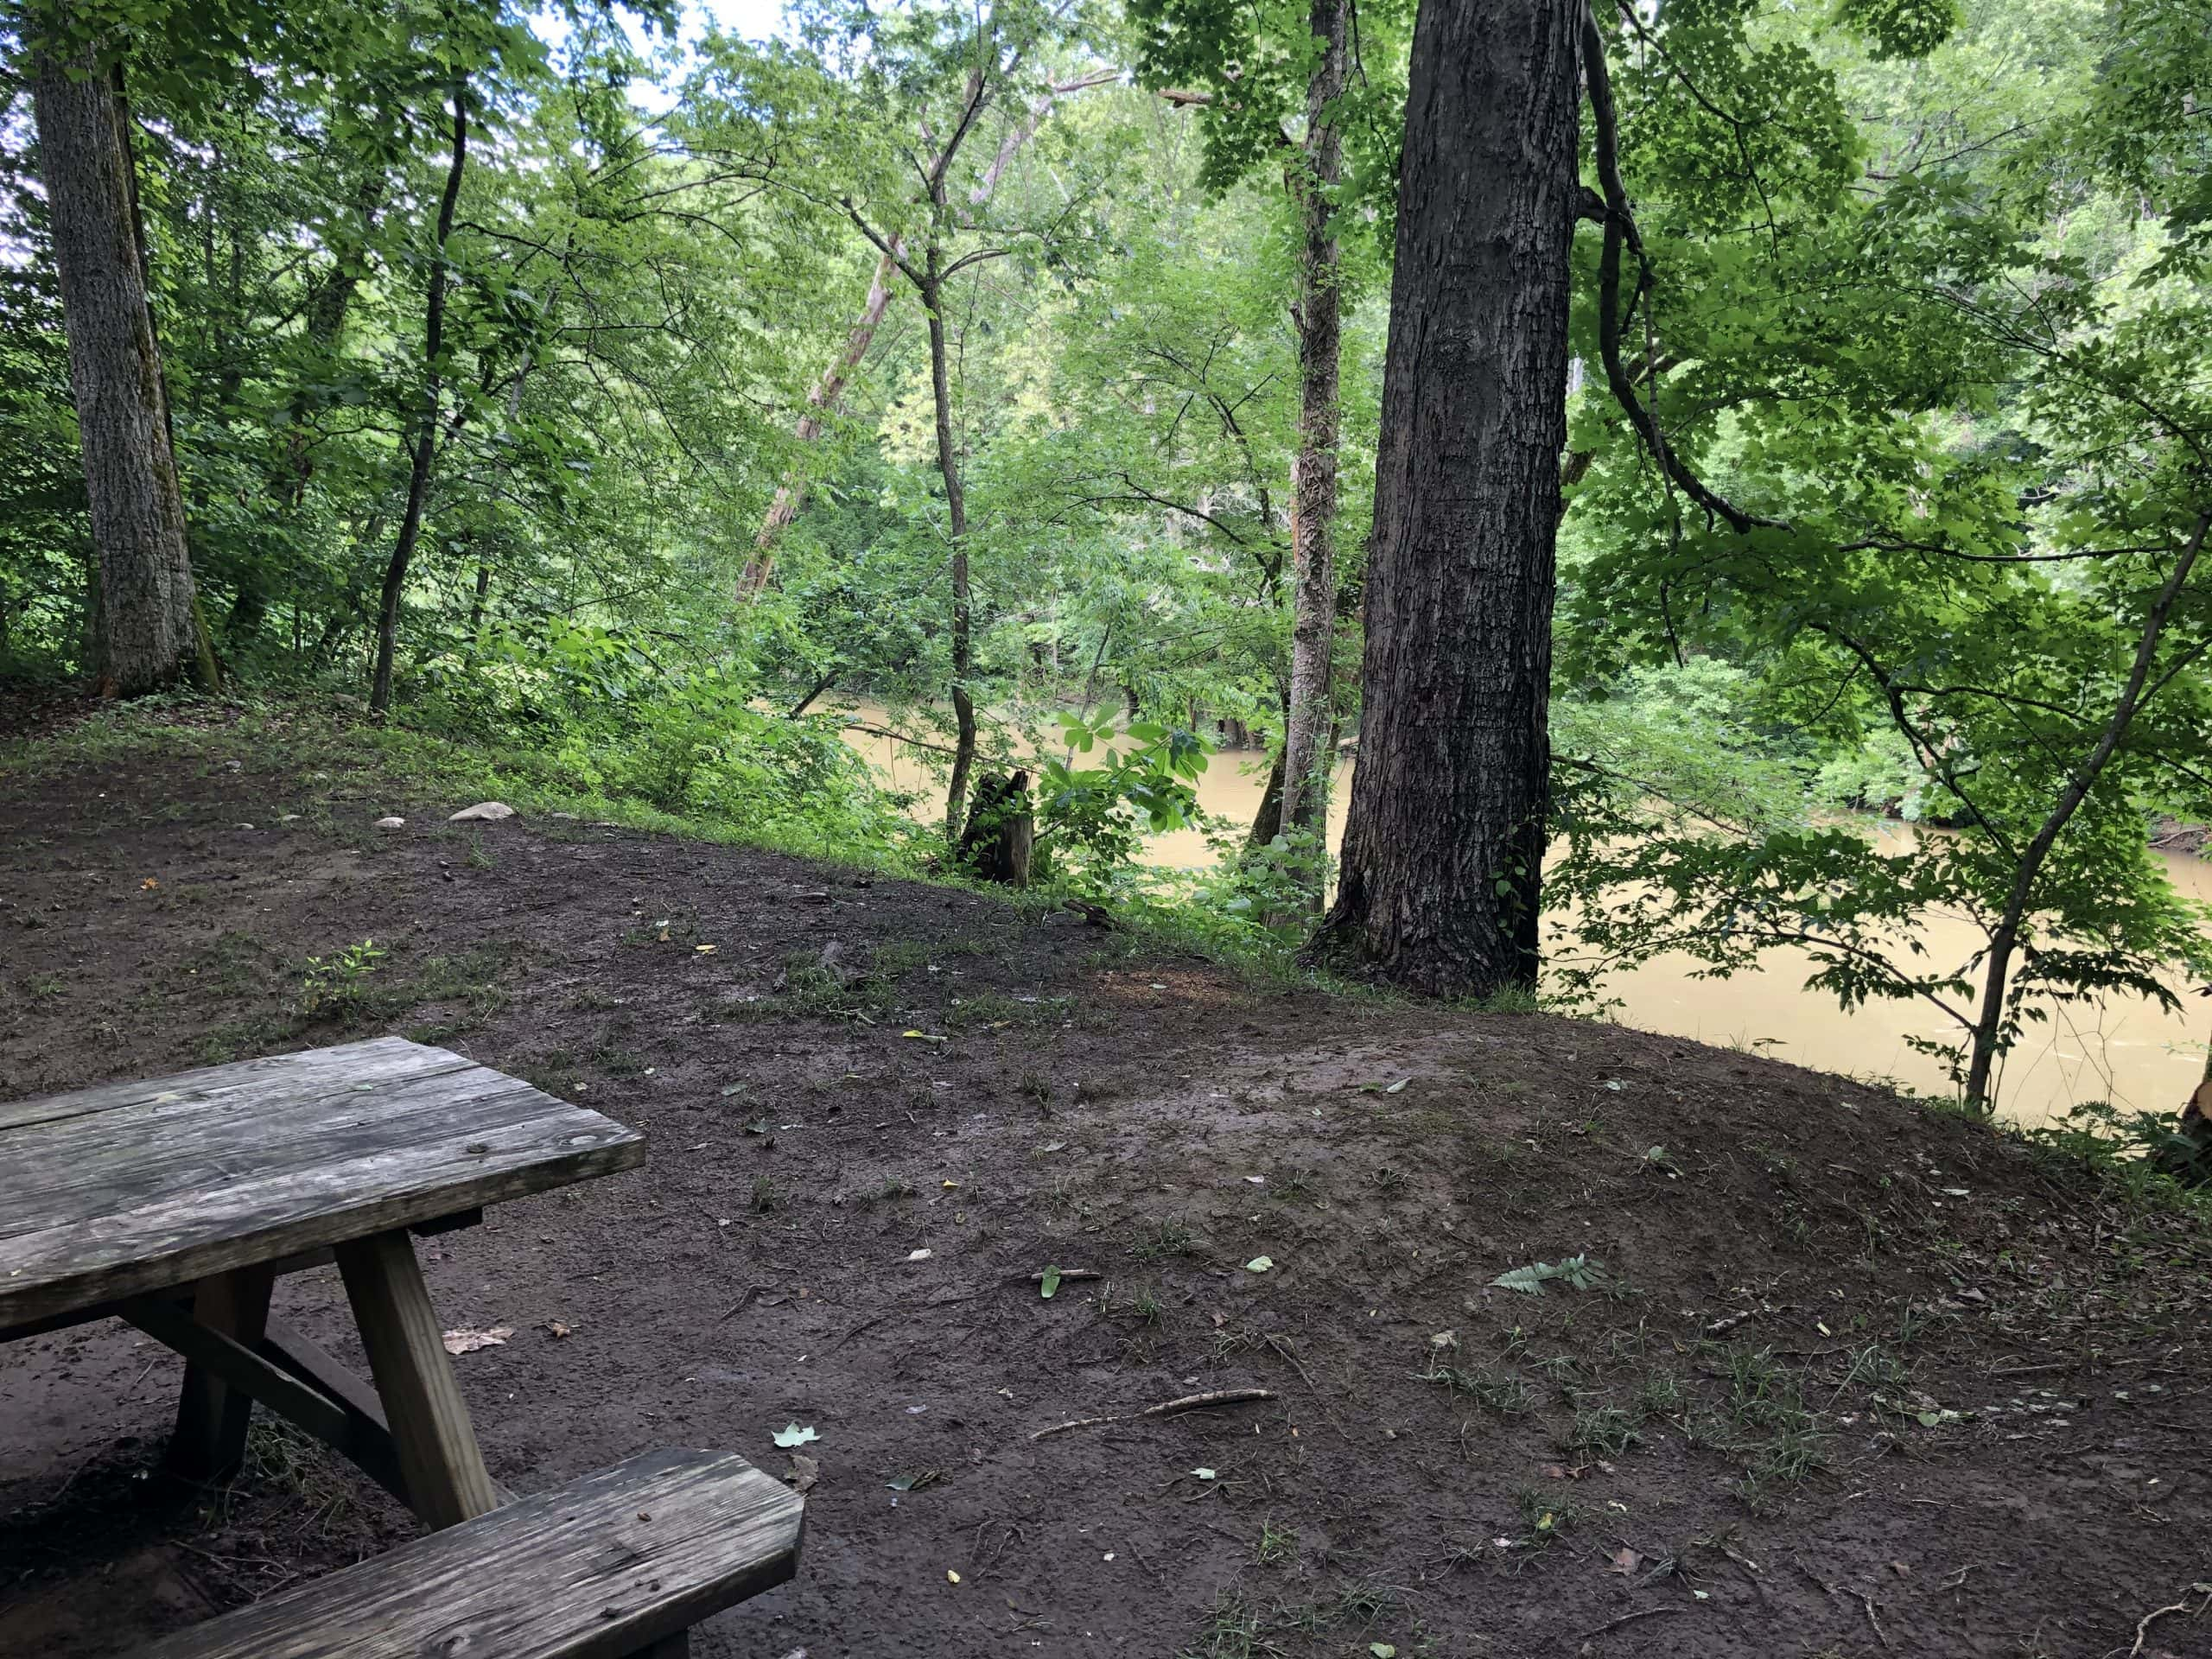 Explorer Park Campsites scaled